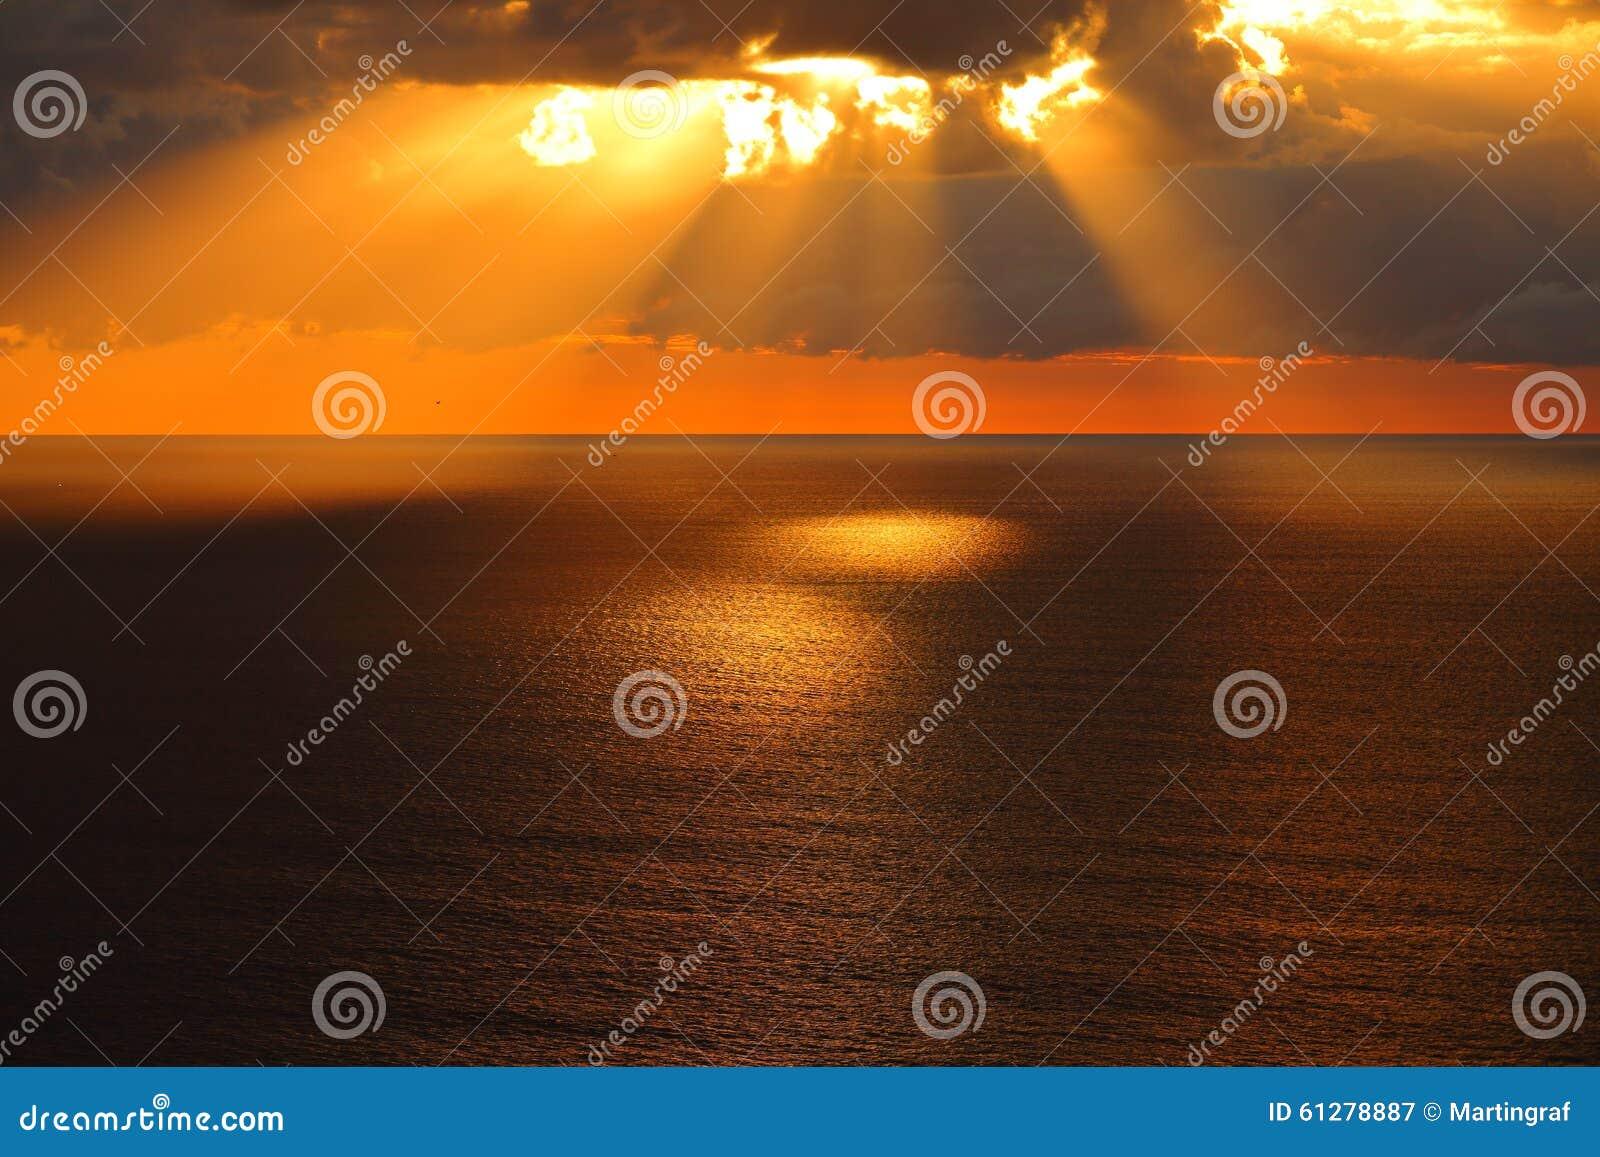 Gouden ochtend bij kalme overzees